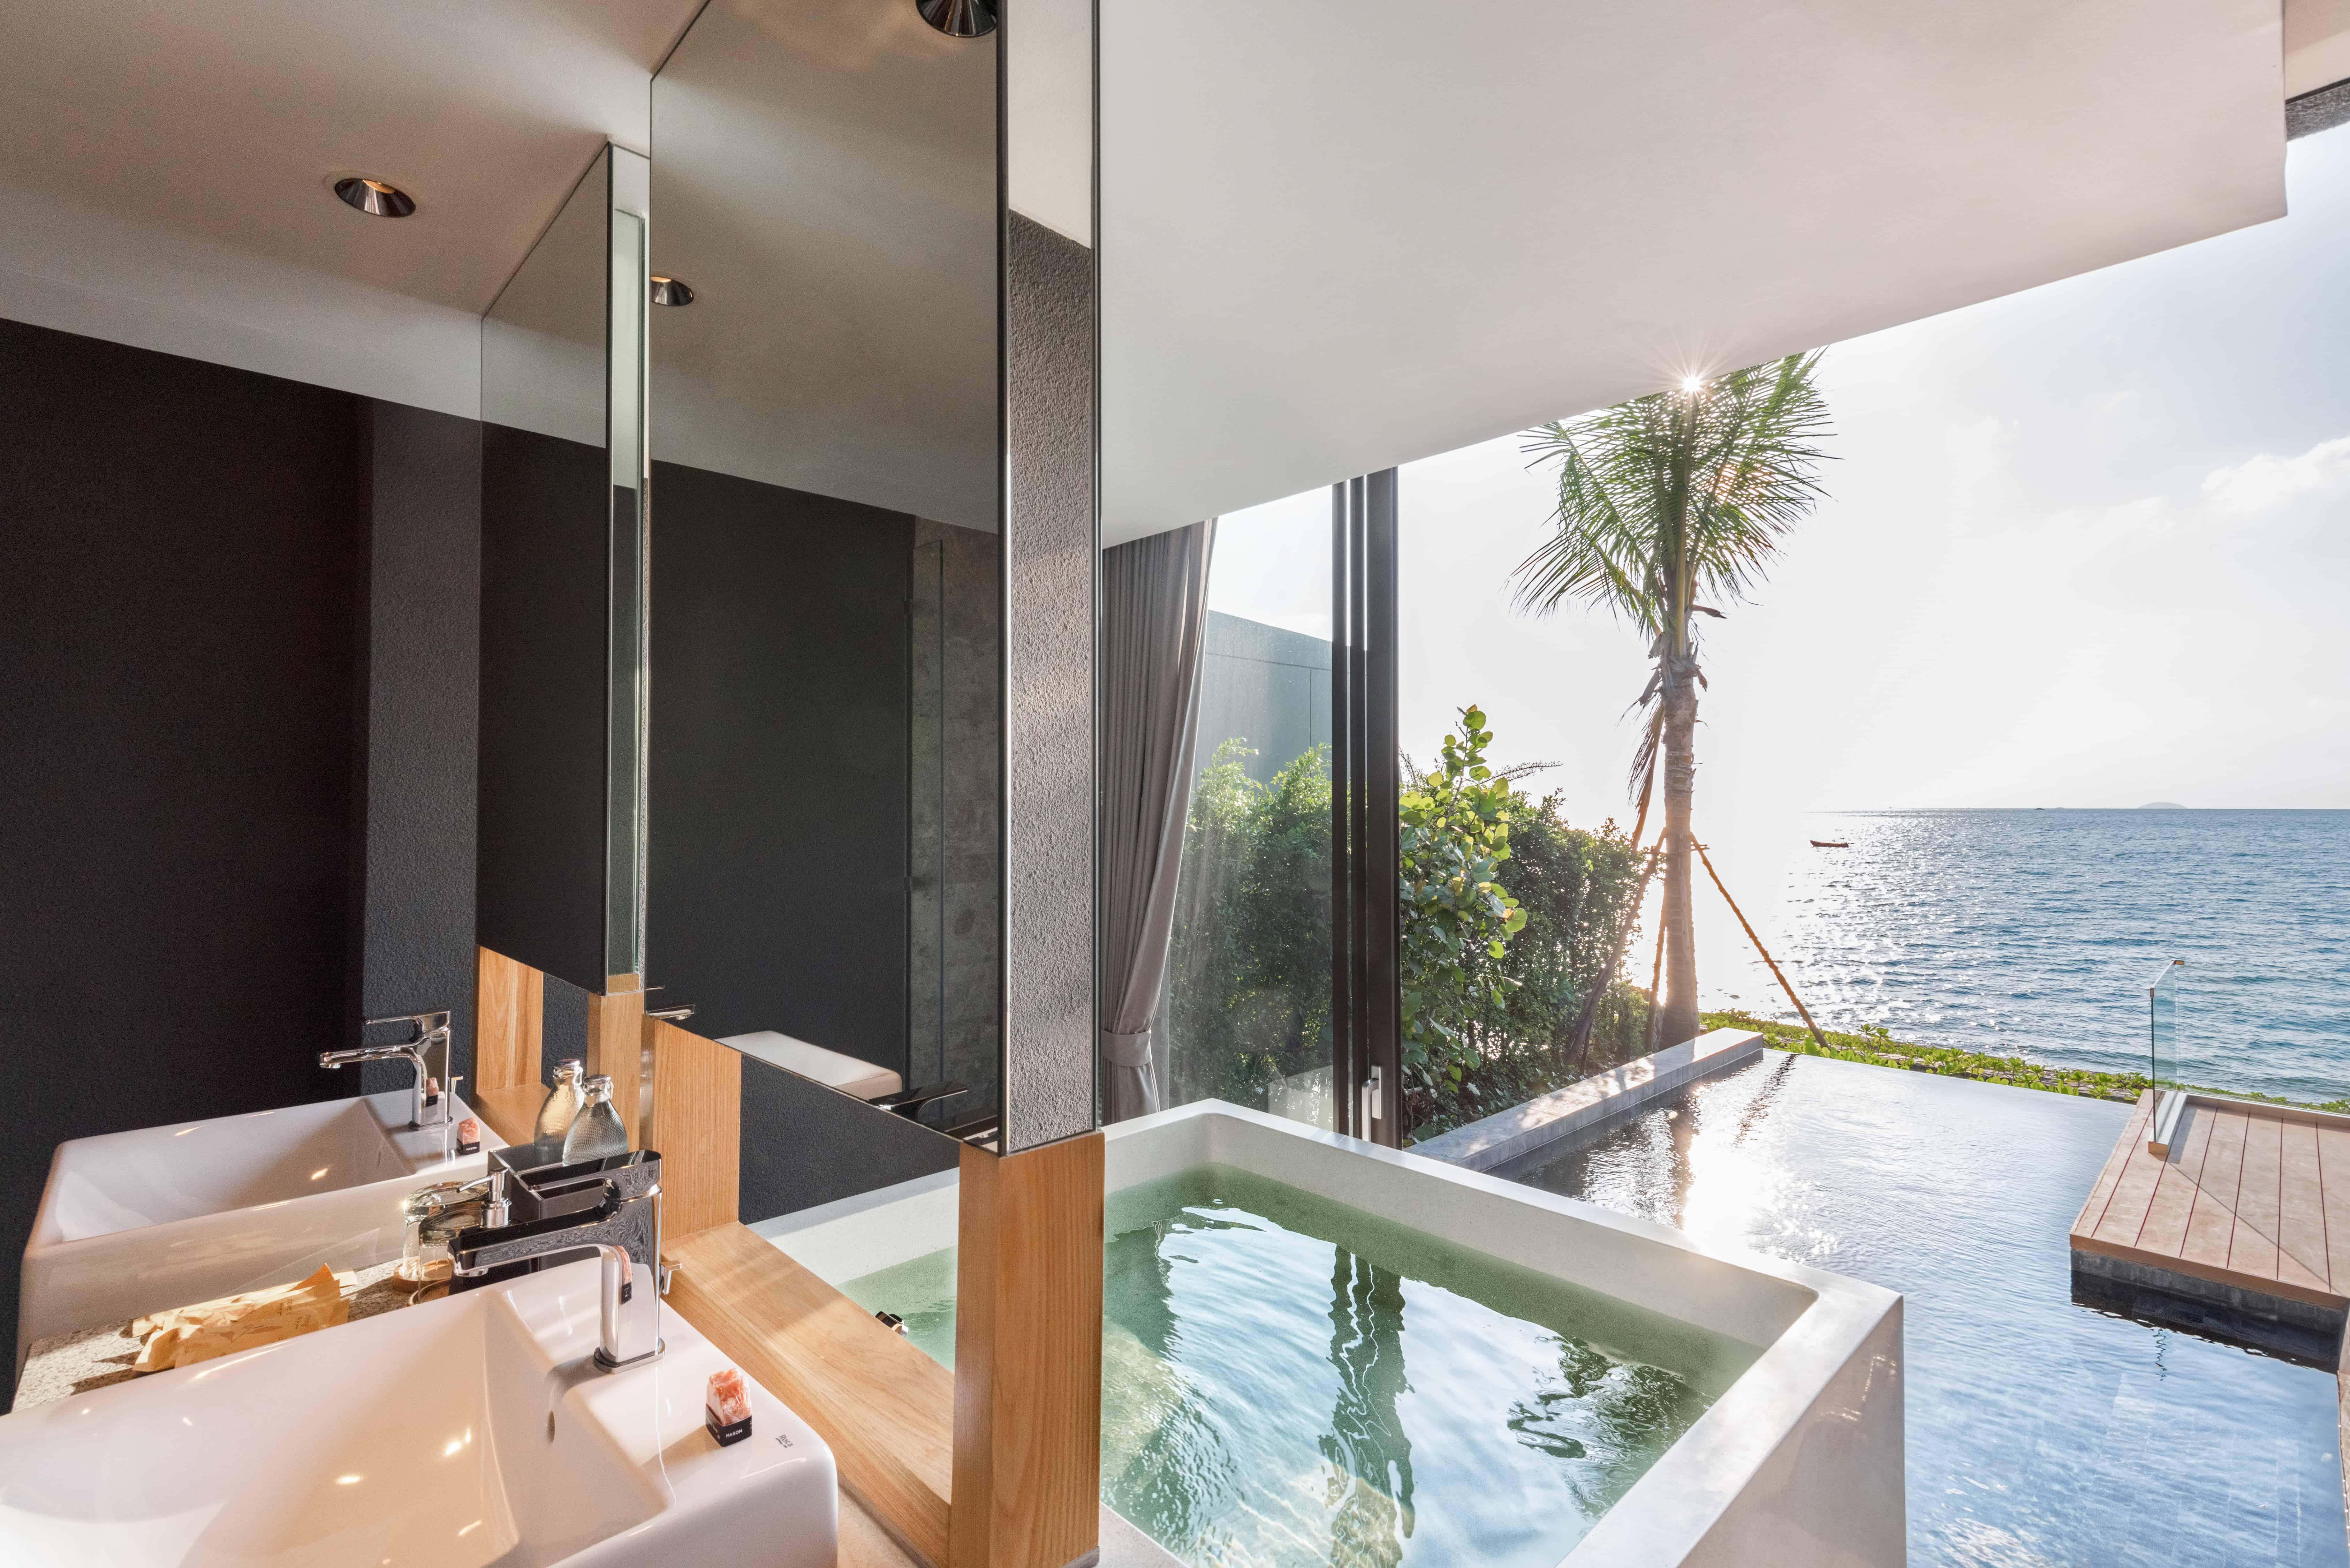 Mason Pattaya Villa - View from Bathroom